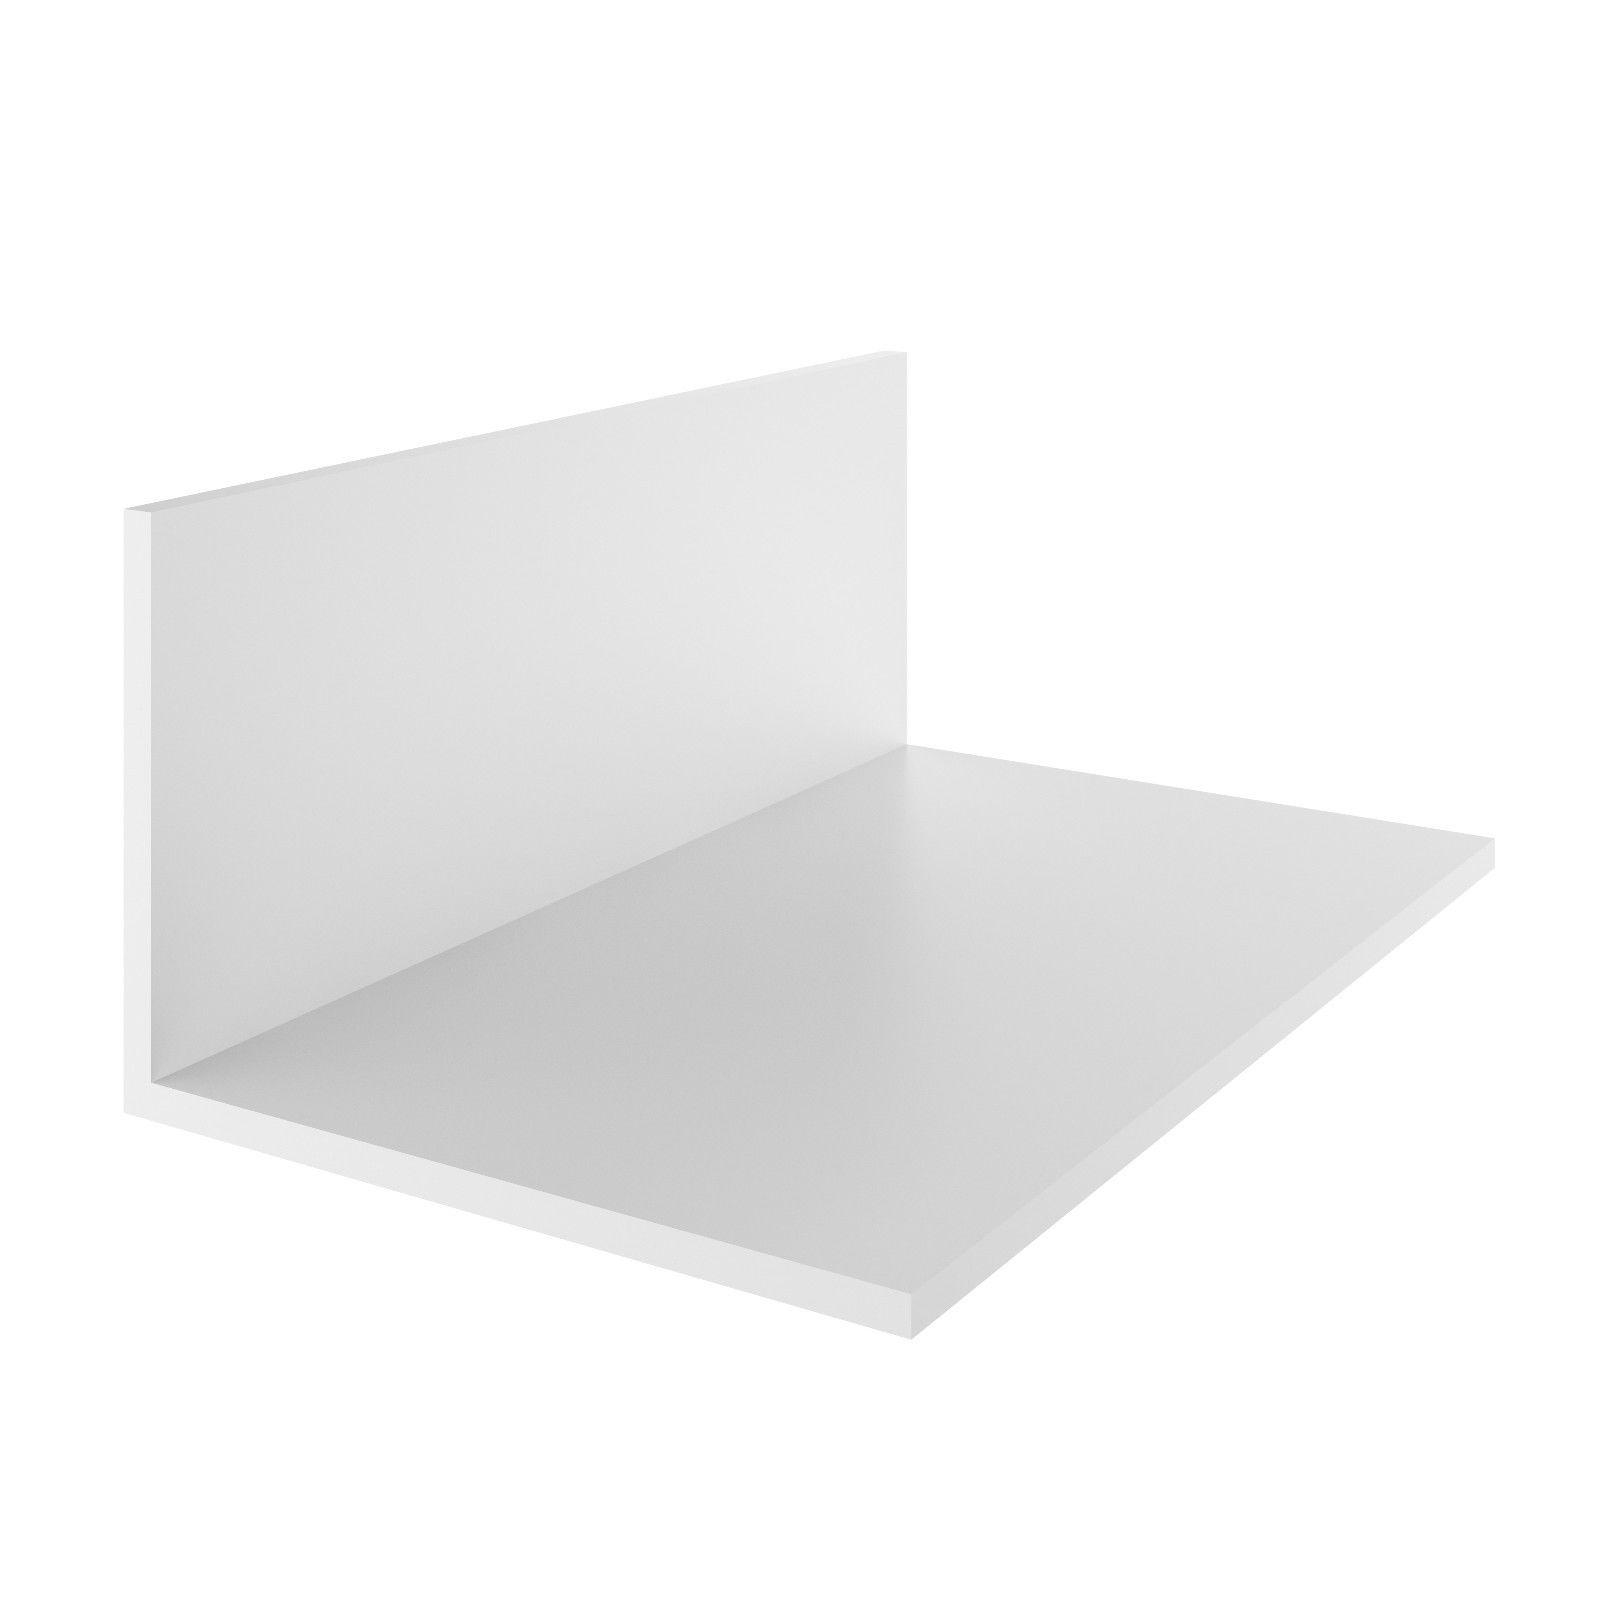 """1,62€/m"" 2m Profil Eckleiste Aussenwinkel PVC-Winkel Winkelprofil Ecke 30x20 mm"